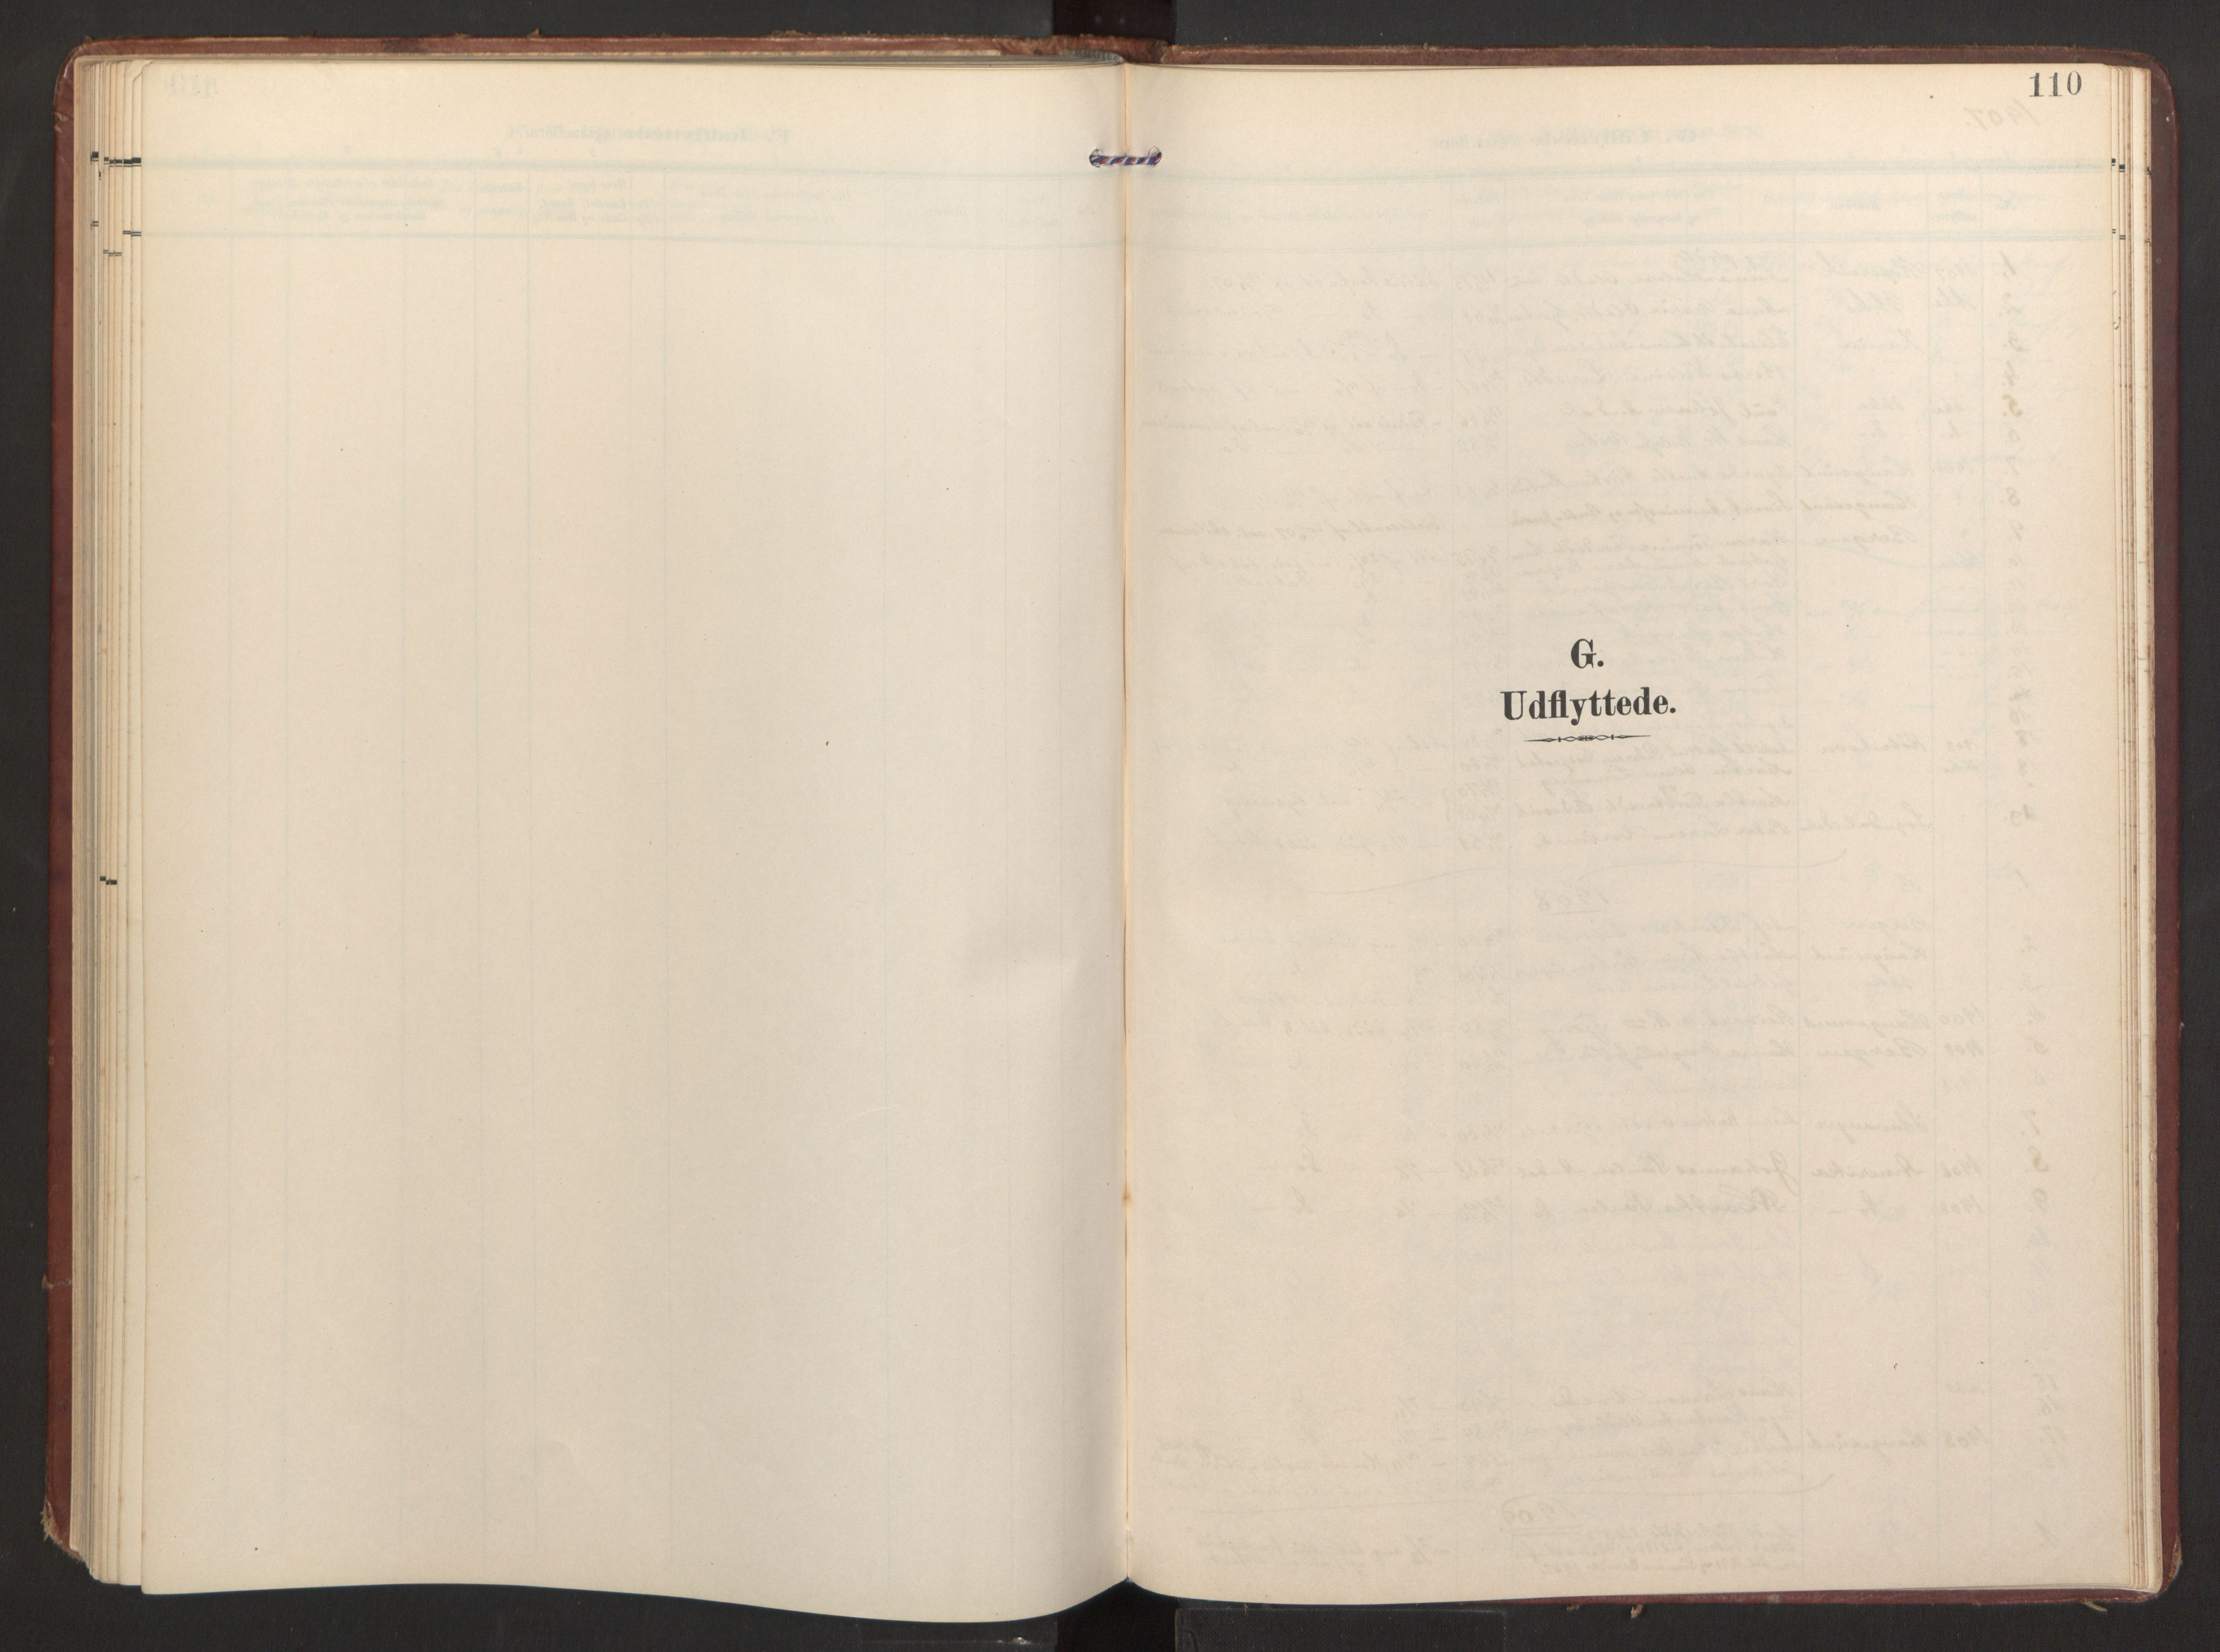 SAB, Finnås sokneprestembete, H/Ha/Haa/Haad/L0003: Ministerialbok nr. D 3, 1907-1921, s. 110